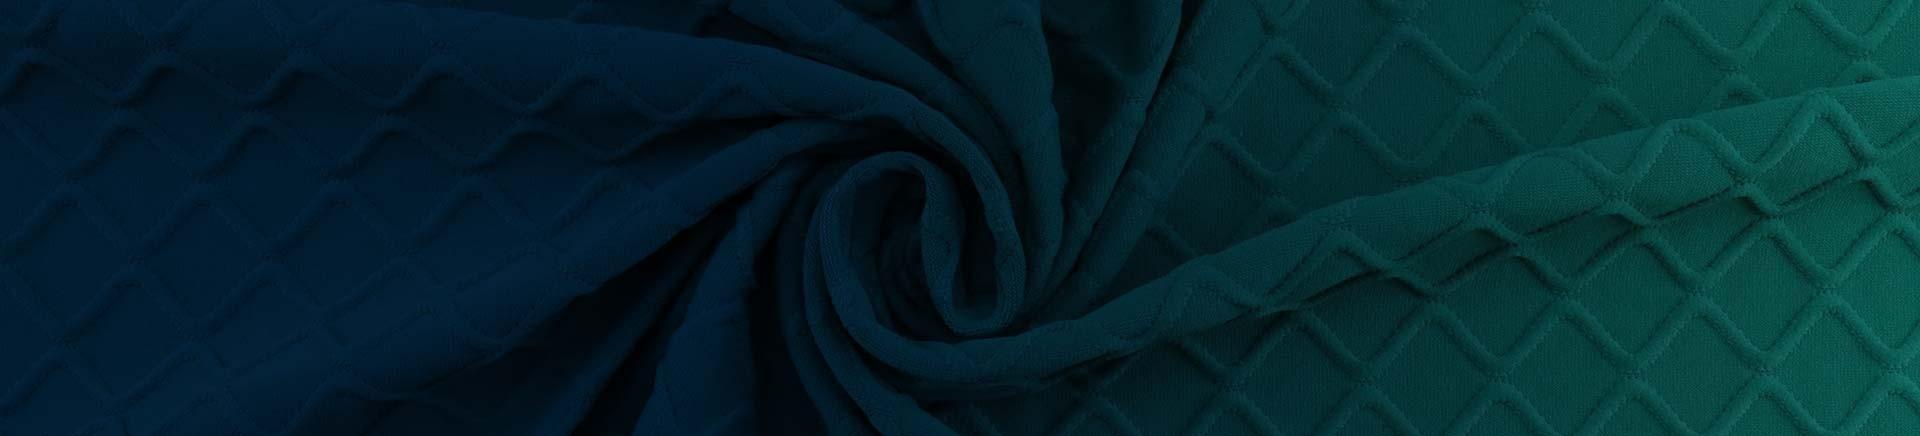 Modaljersey | JAVRO Stoffmarkt